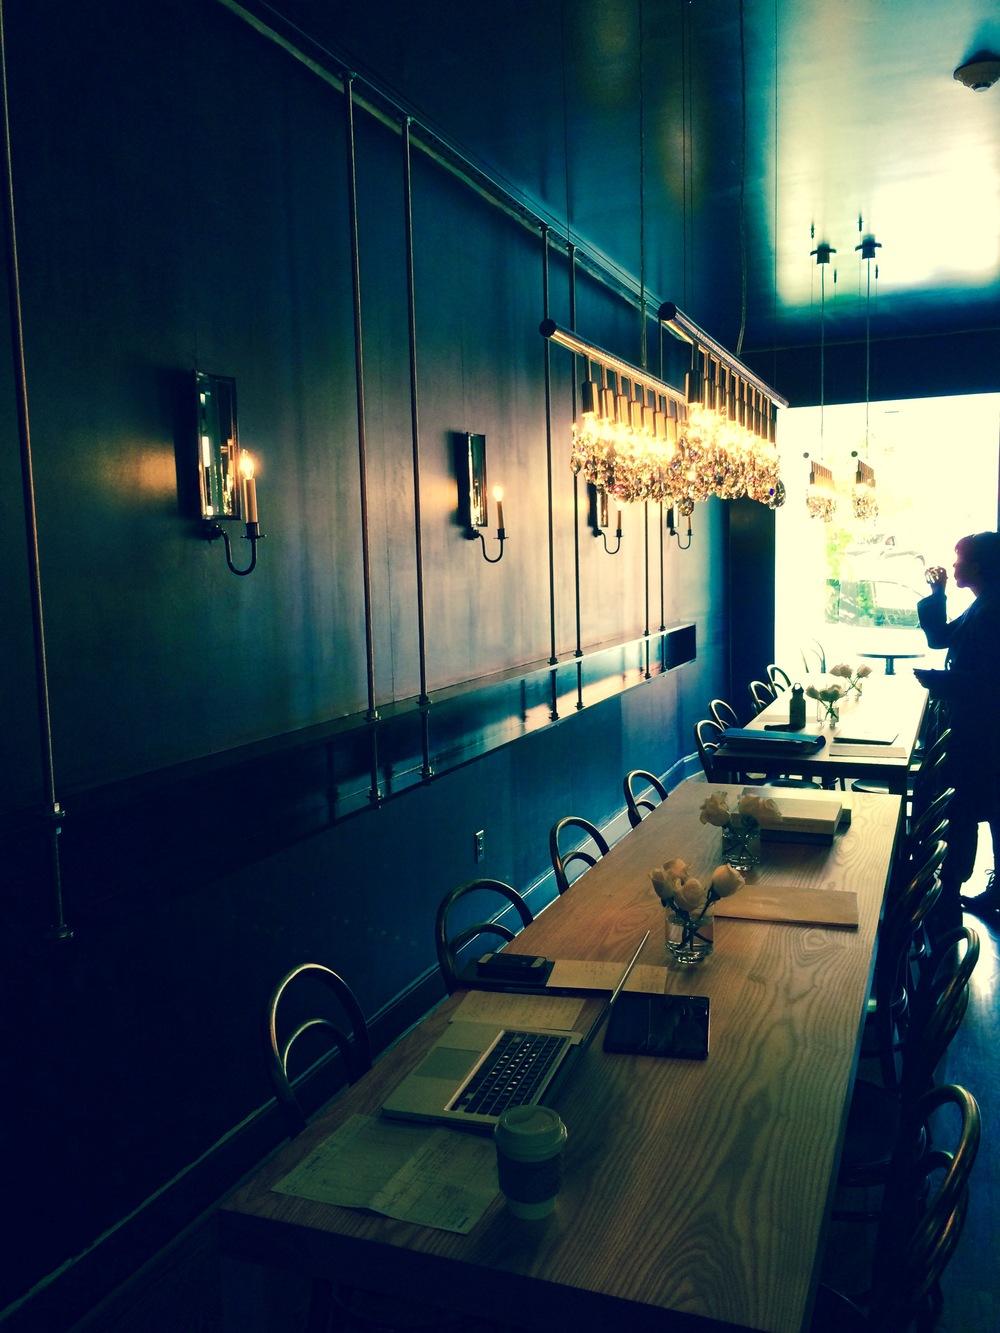 After Peacock Room interior  | Courtesy of Chef Sebastien Rondier